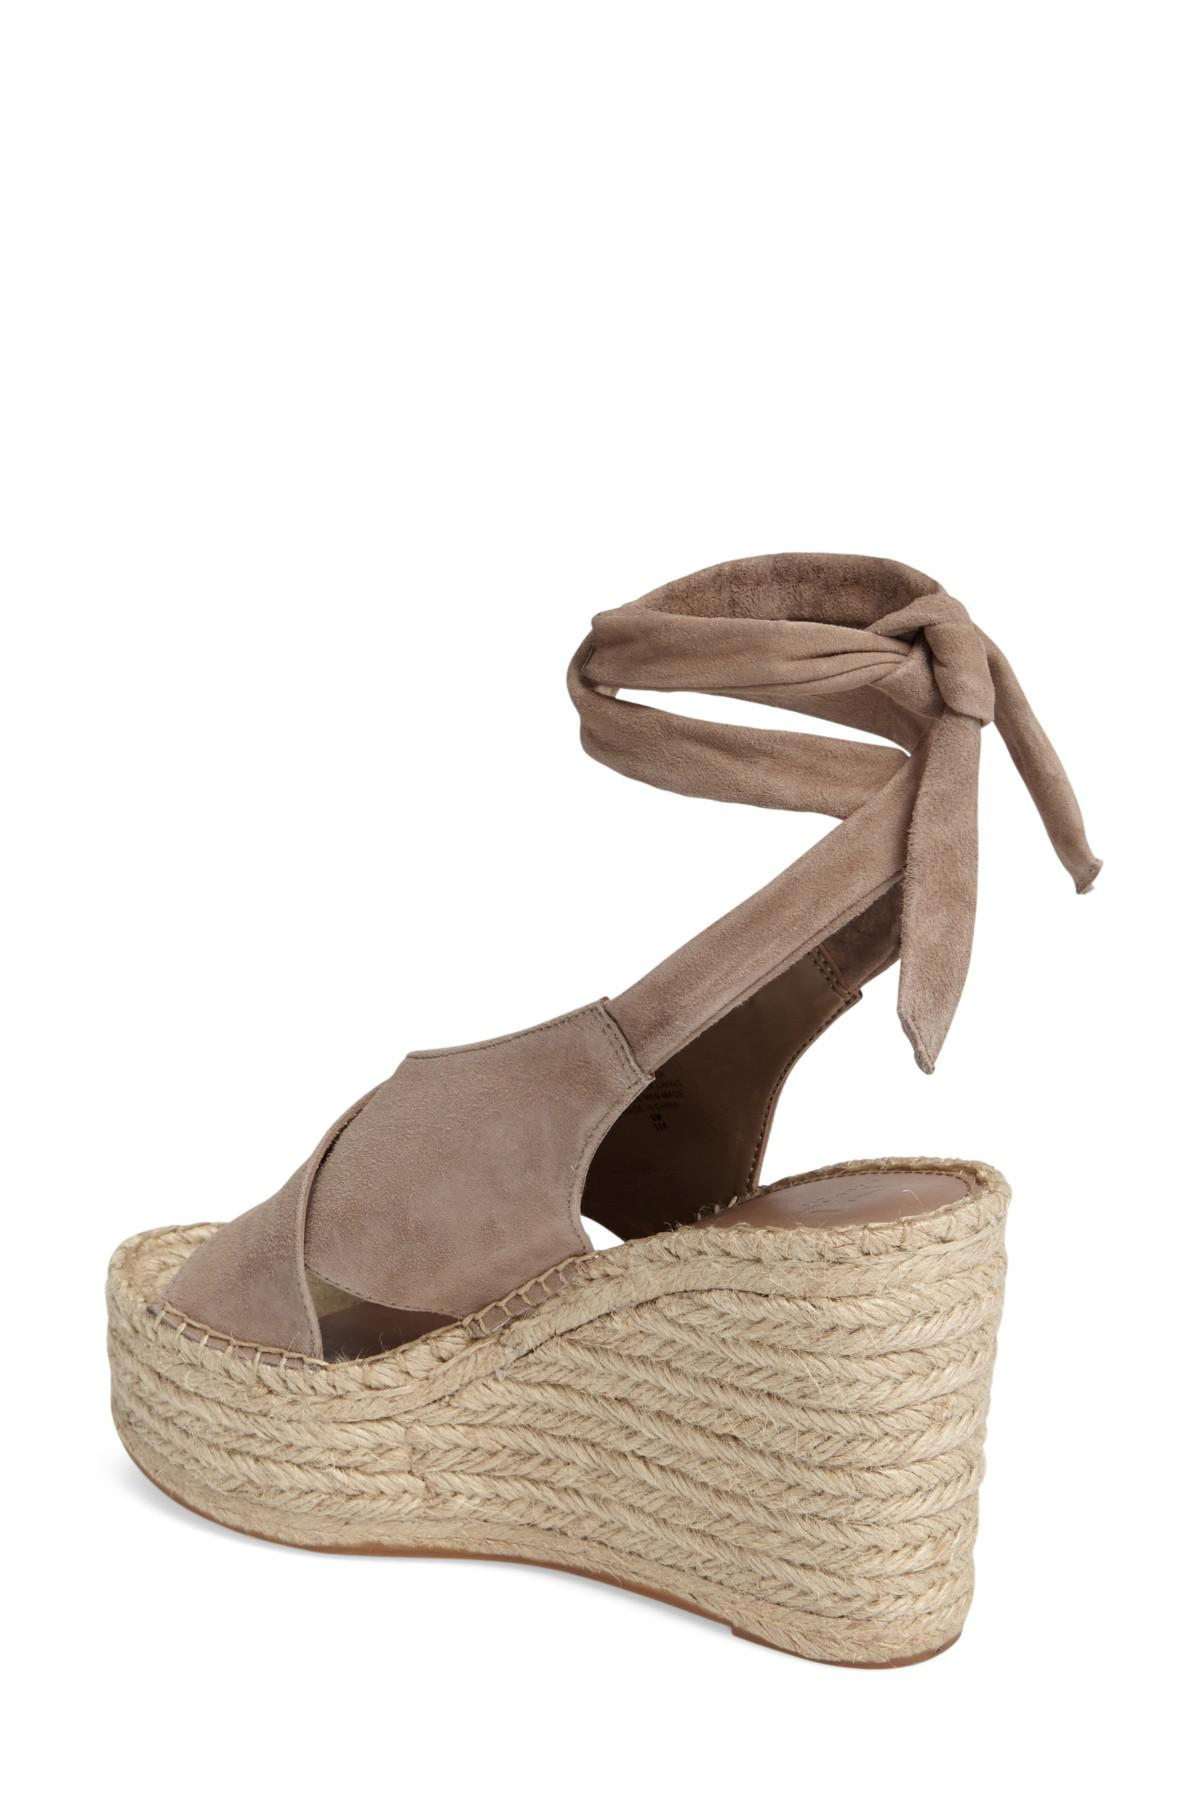 ddd0a7bf043 Lyst - Marc Fisher Andira Platform Wedge Sandal in Brown